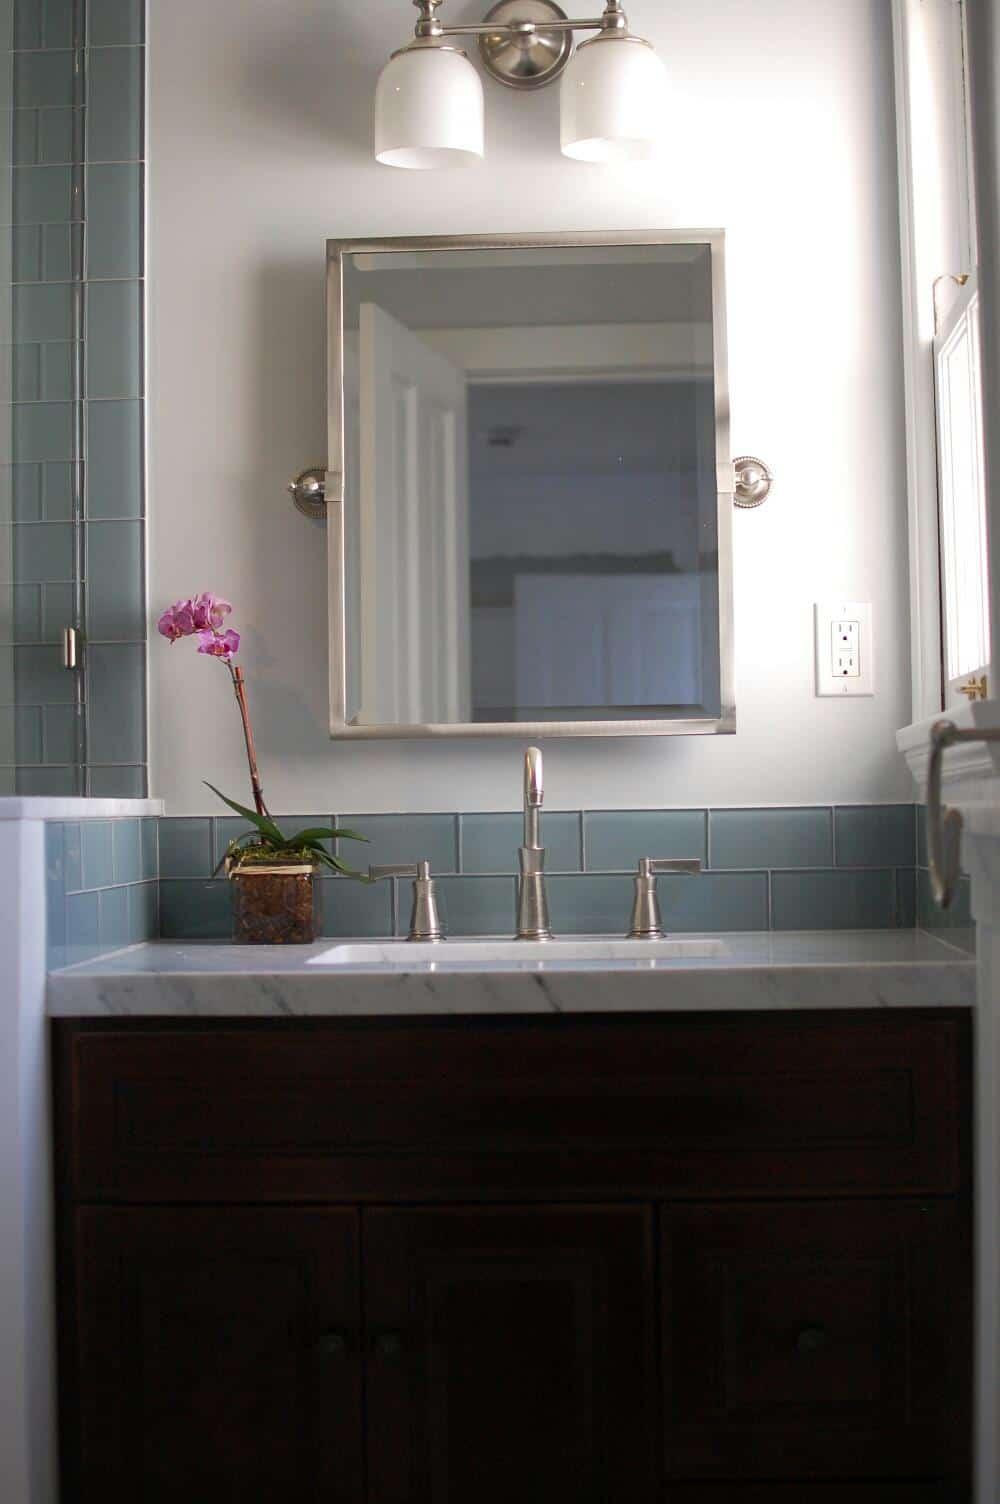 captivating-bathroom-glass-backsplash-ocean-subway-tile-backsplash-jpg